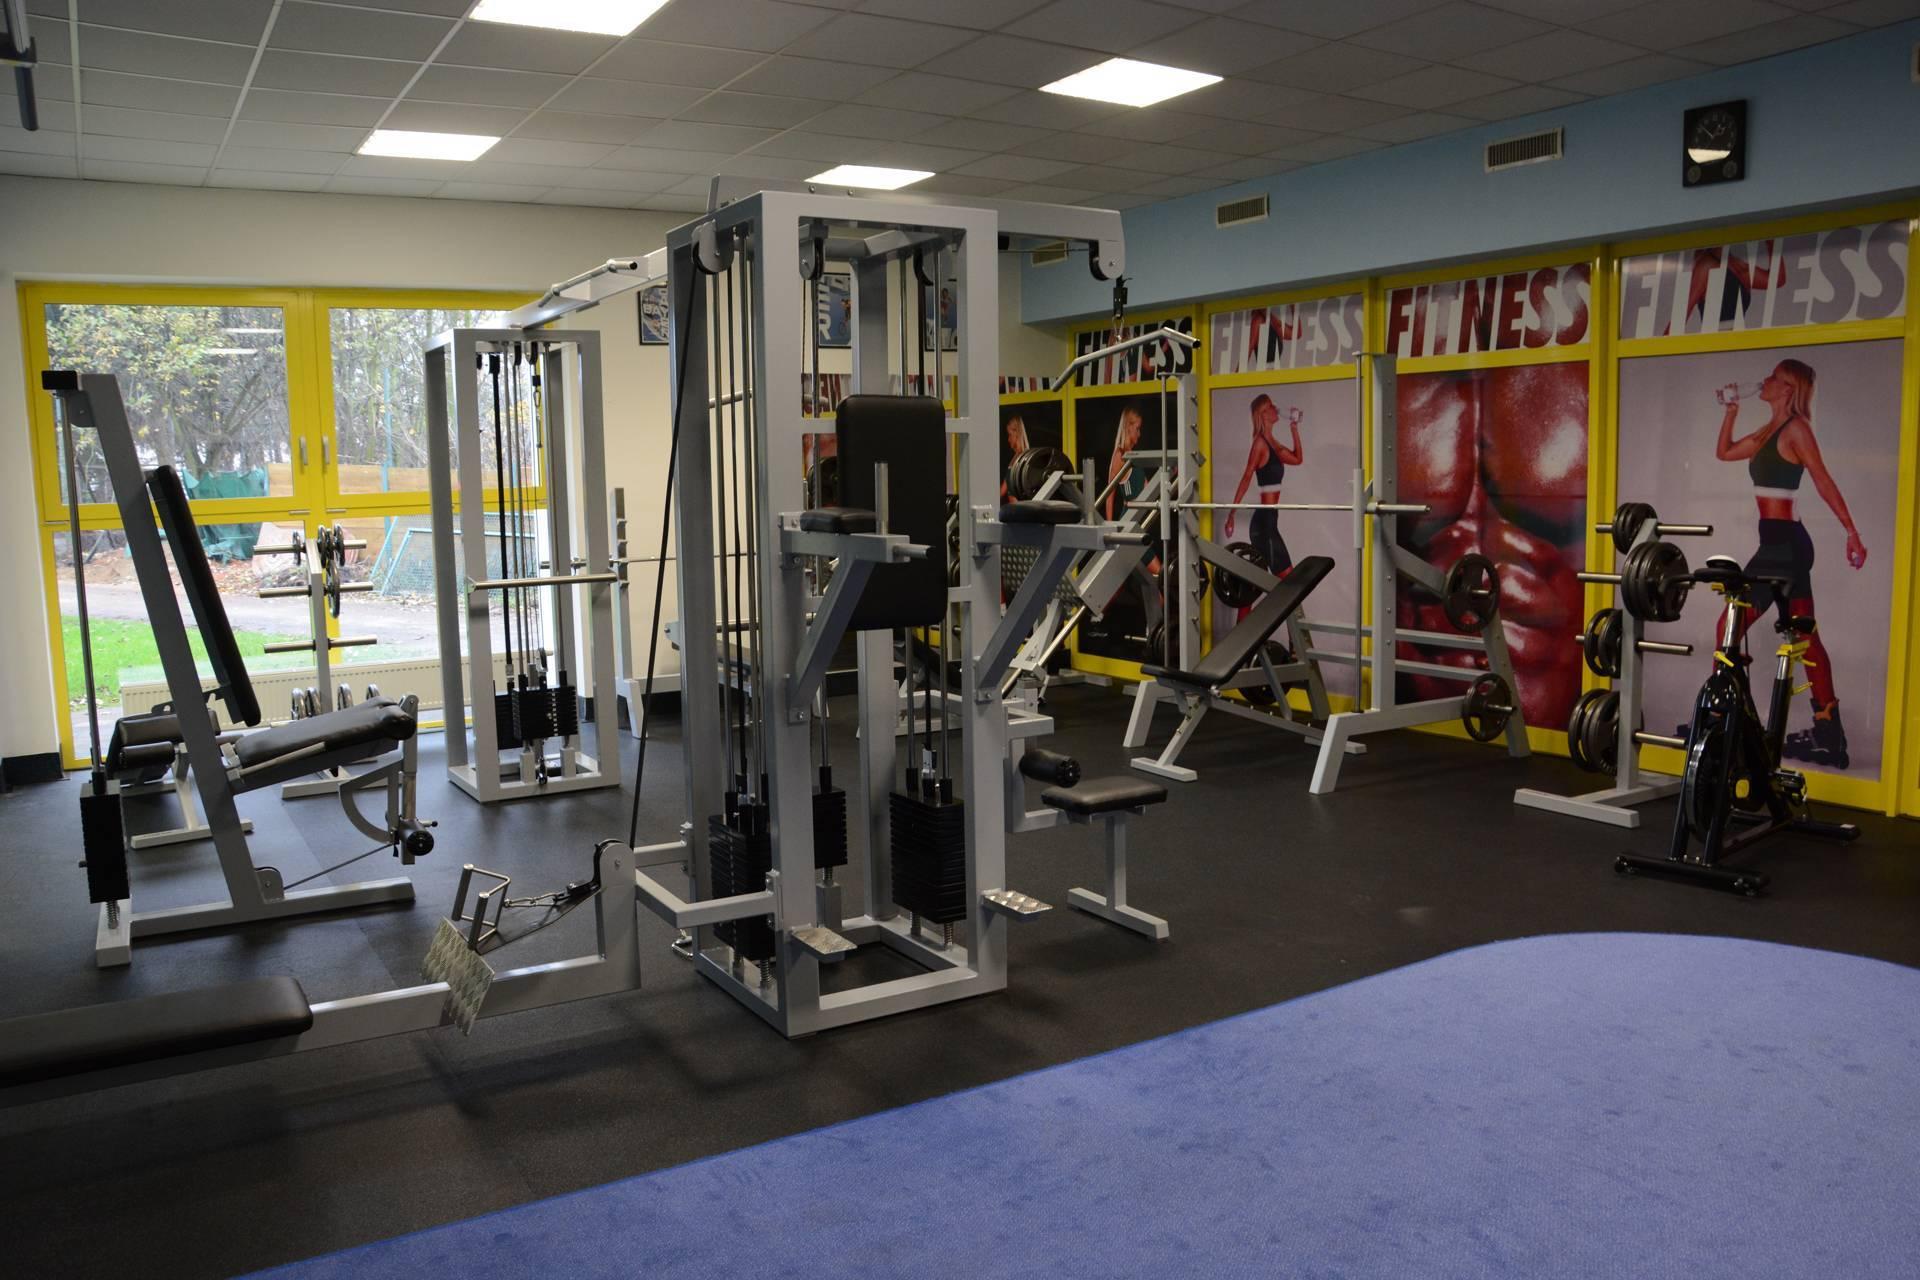 Fitness centrum{lang}Fitness center